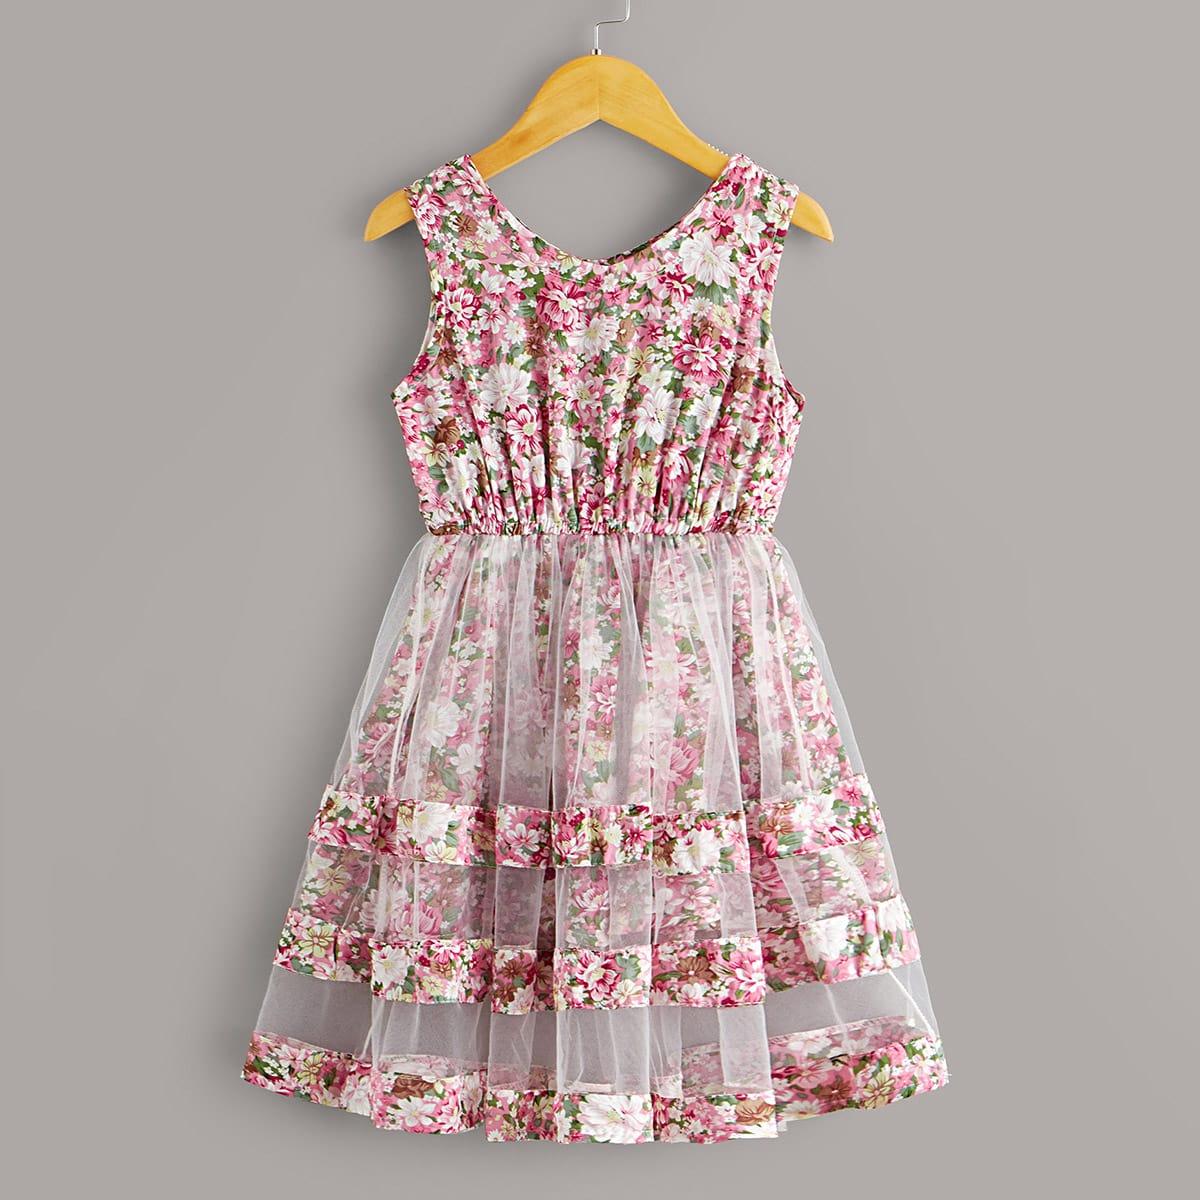 SHEIN / Toddler Girls Floral Mesh Panel A-line Dress